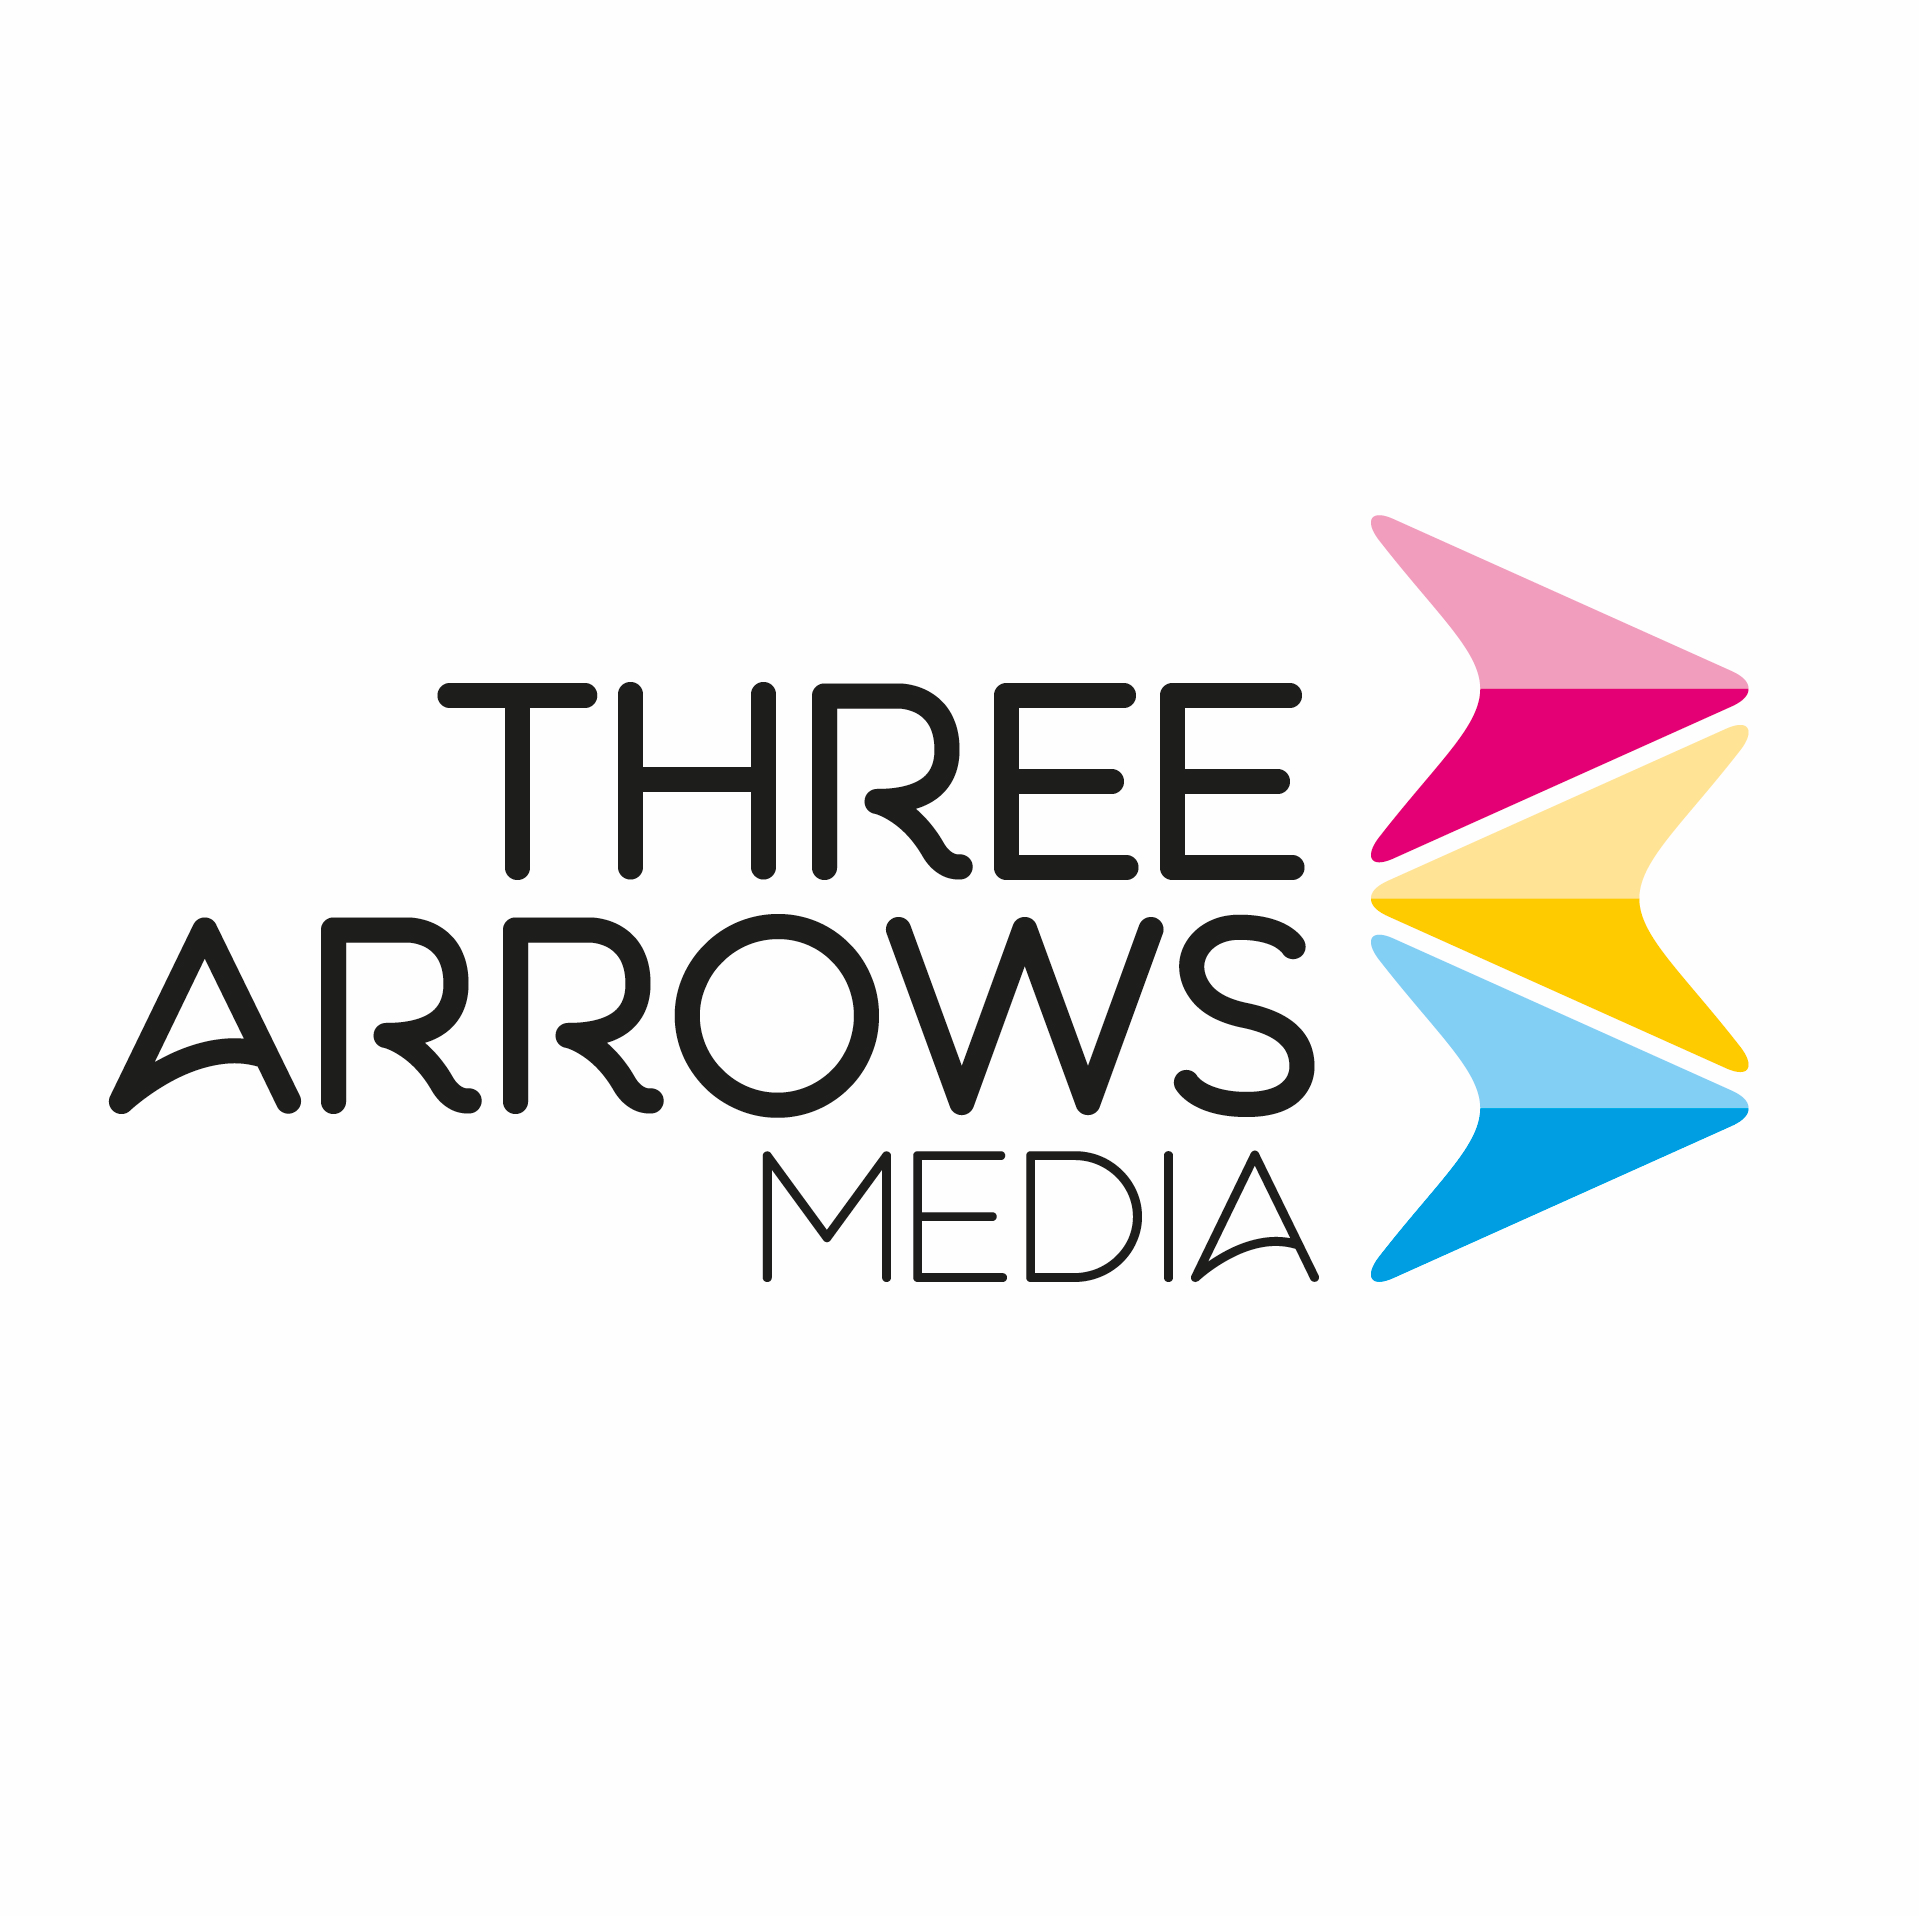 3 arrows_FINAL_CMYK-04 small[2] copy